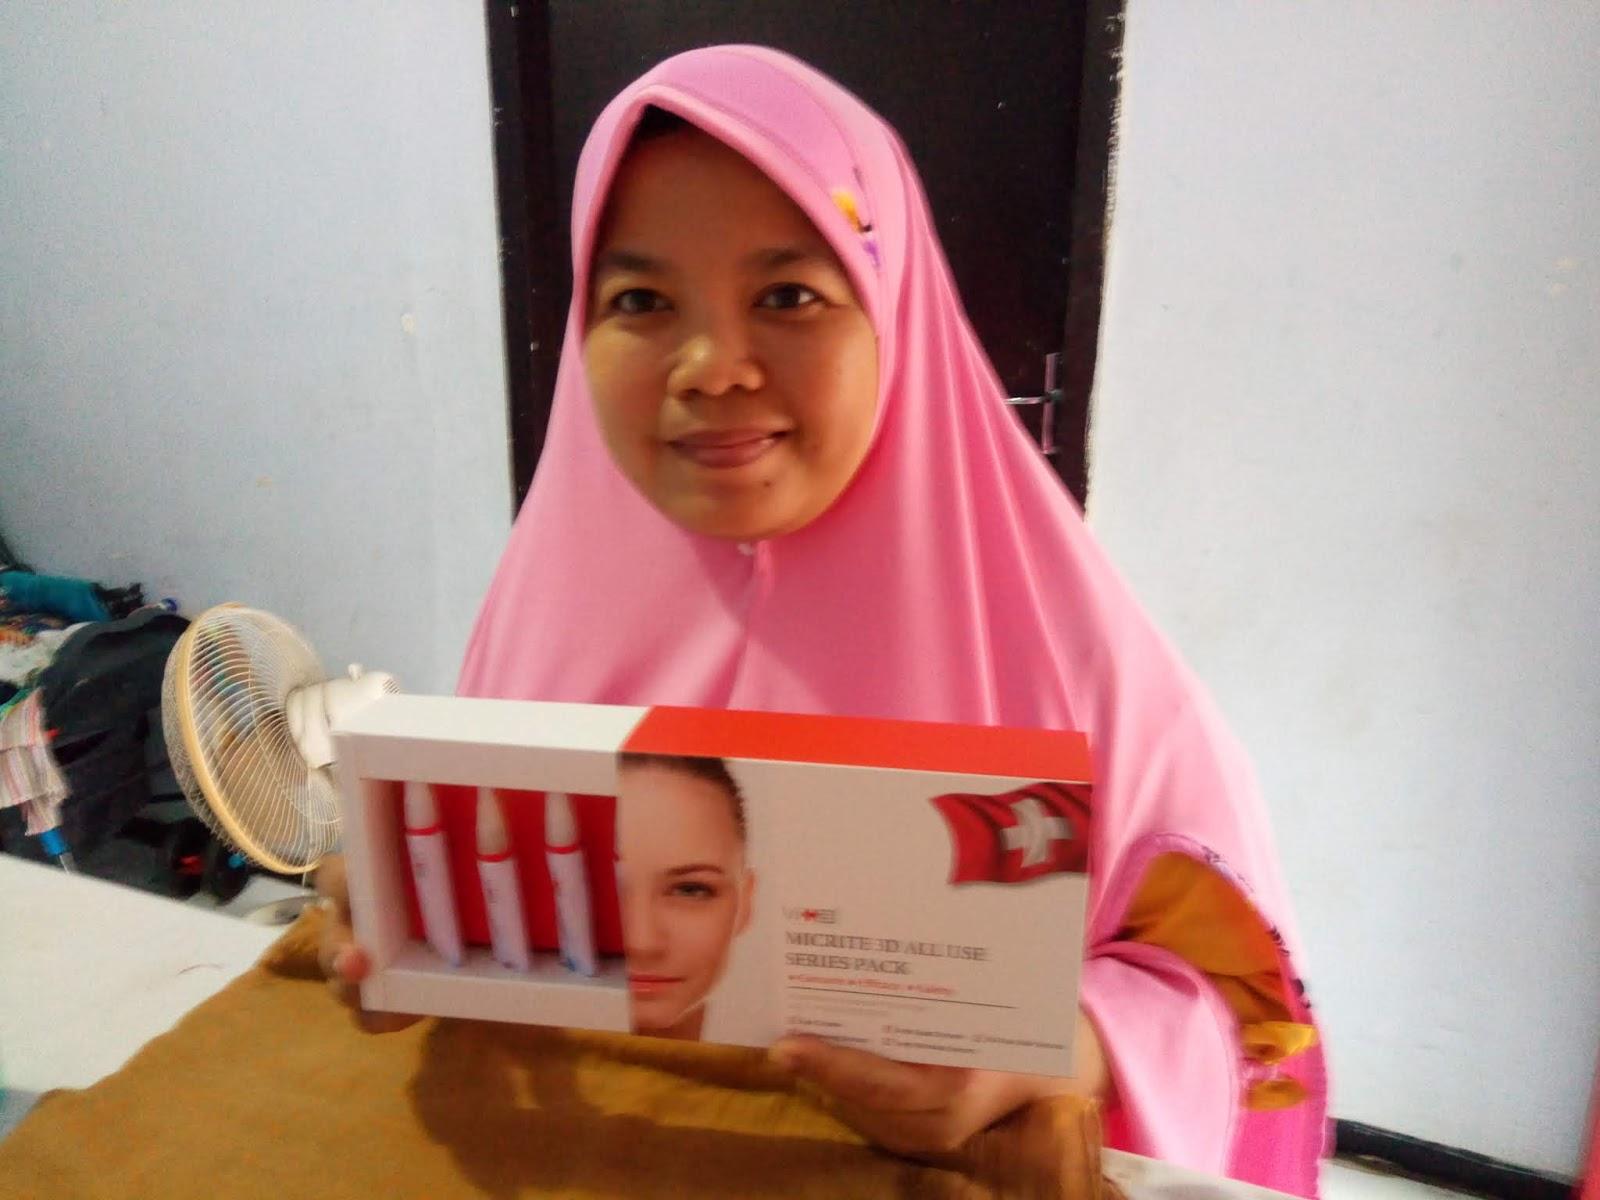 Istana Bunda Vian Produk Ukm Bumn Bella Dan Balon Merah Saya Memilih Micrite 3d All Use Eye Cream Sebagai Pertama Langkahnya Berikut